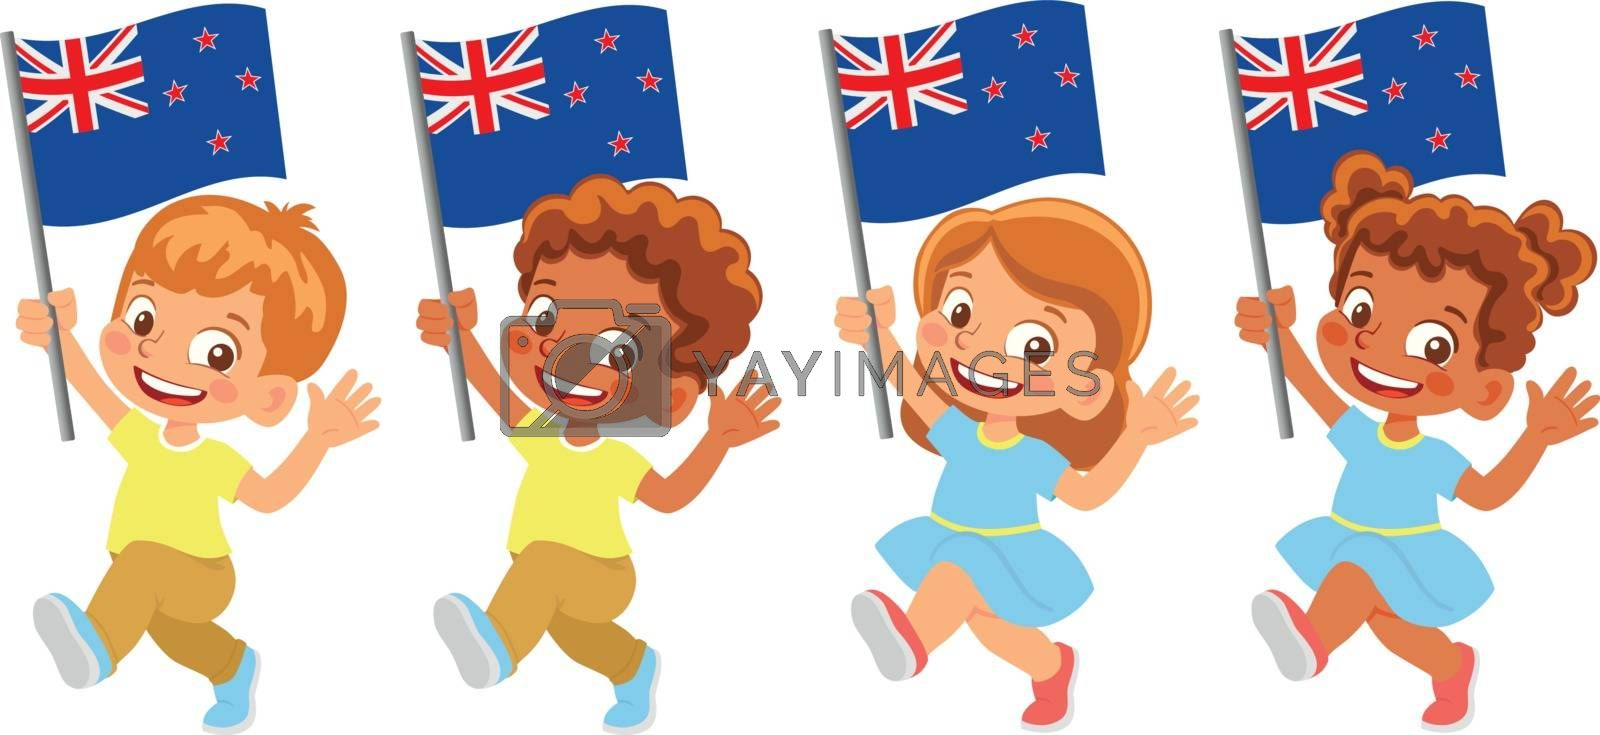 New Zealand flag in hand. Children holding flag. National flag of New Zealand vector